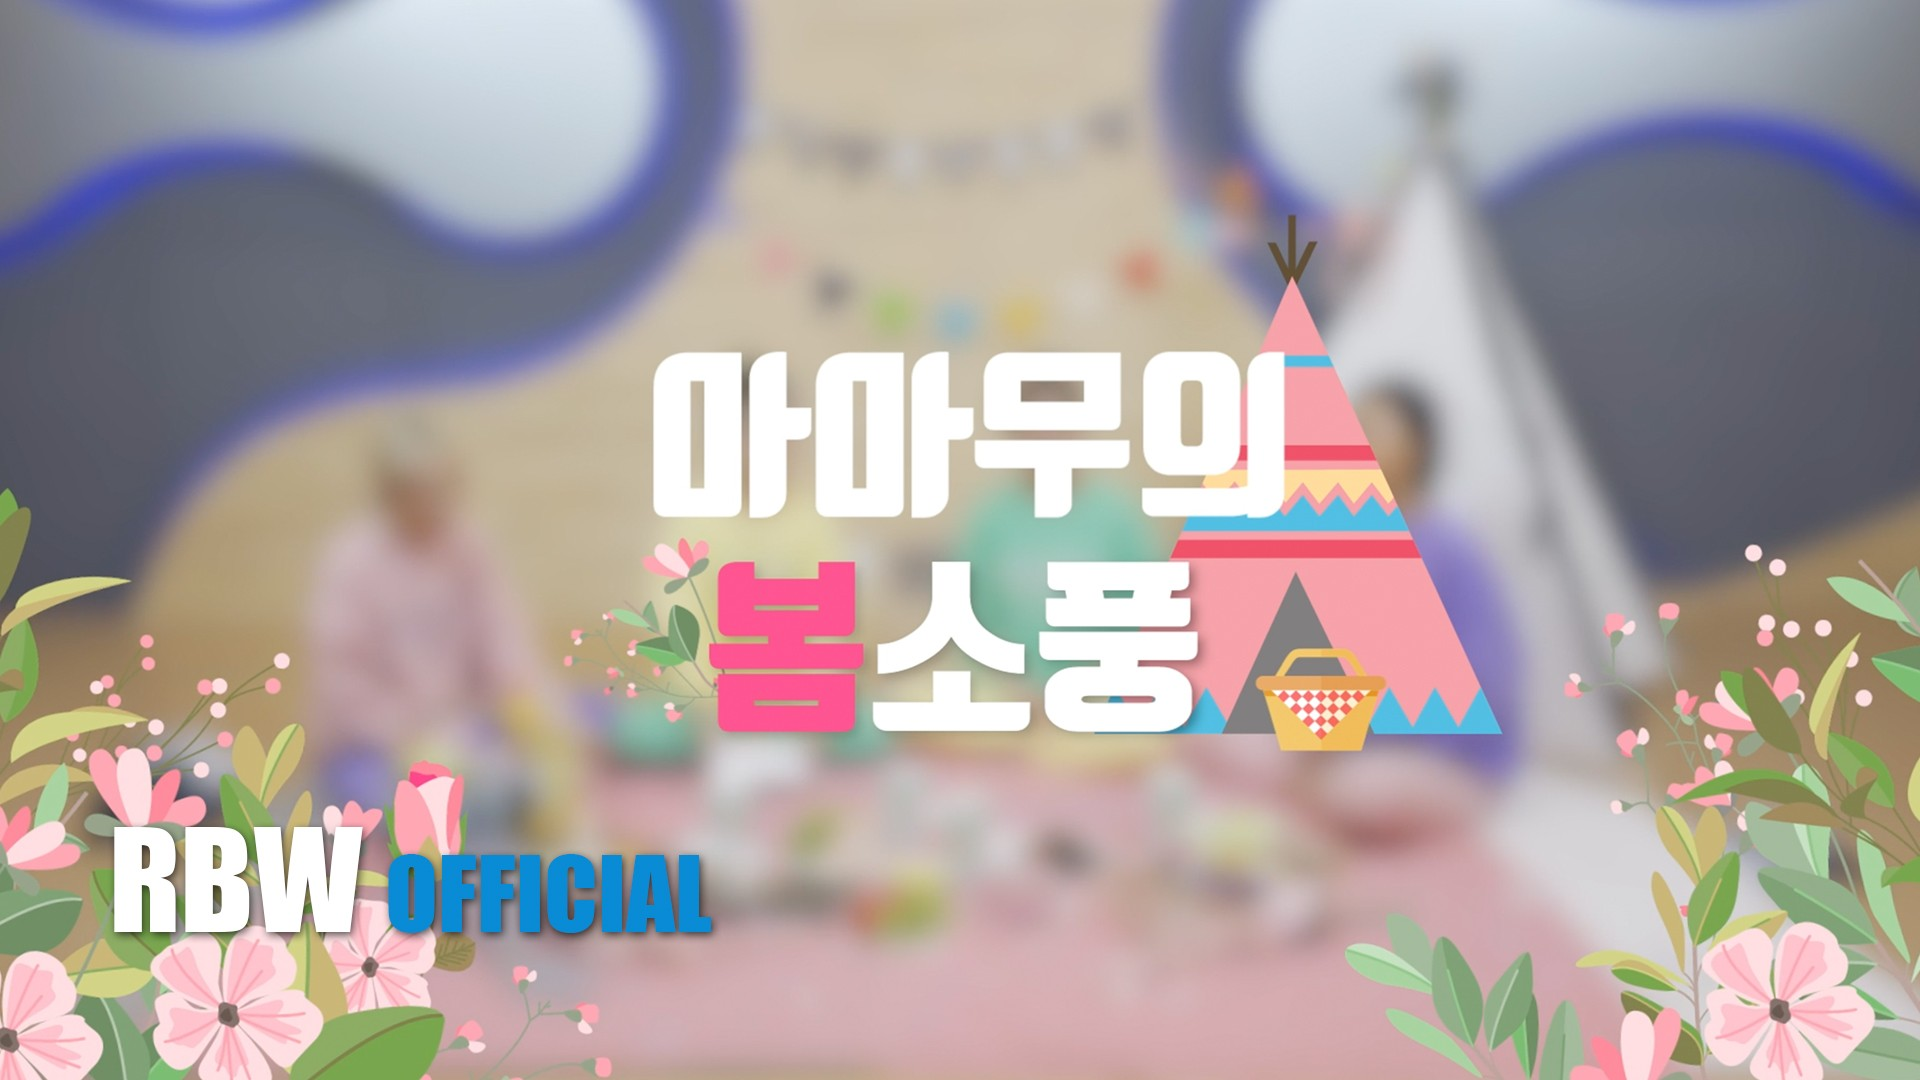 [Special] 4season F/W CONCERT VCR - 마마무의 봄소풍